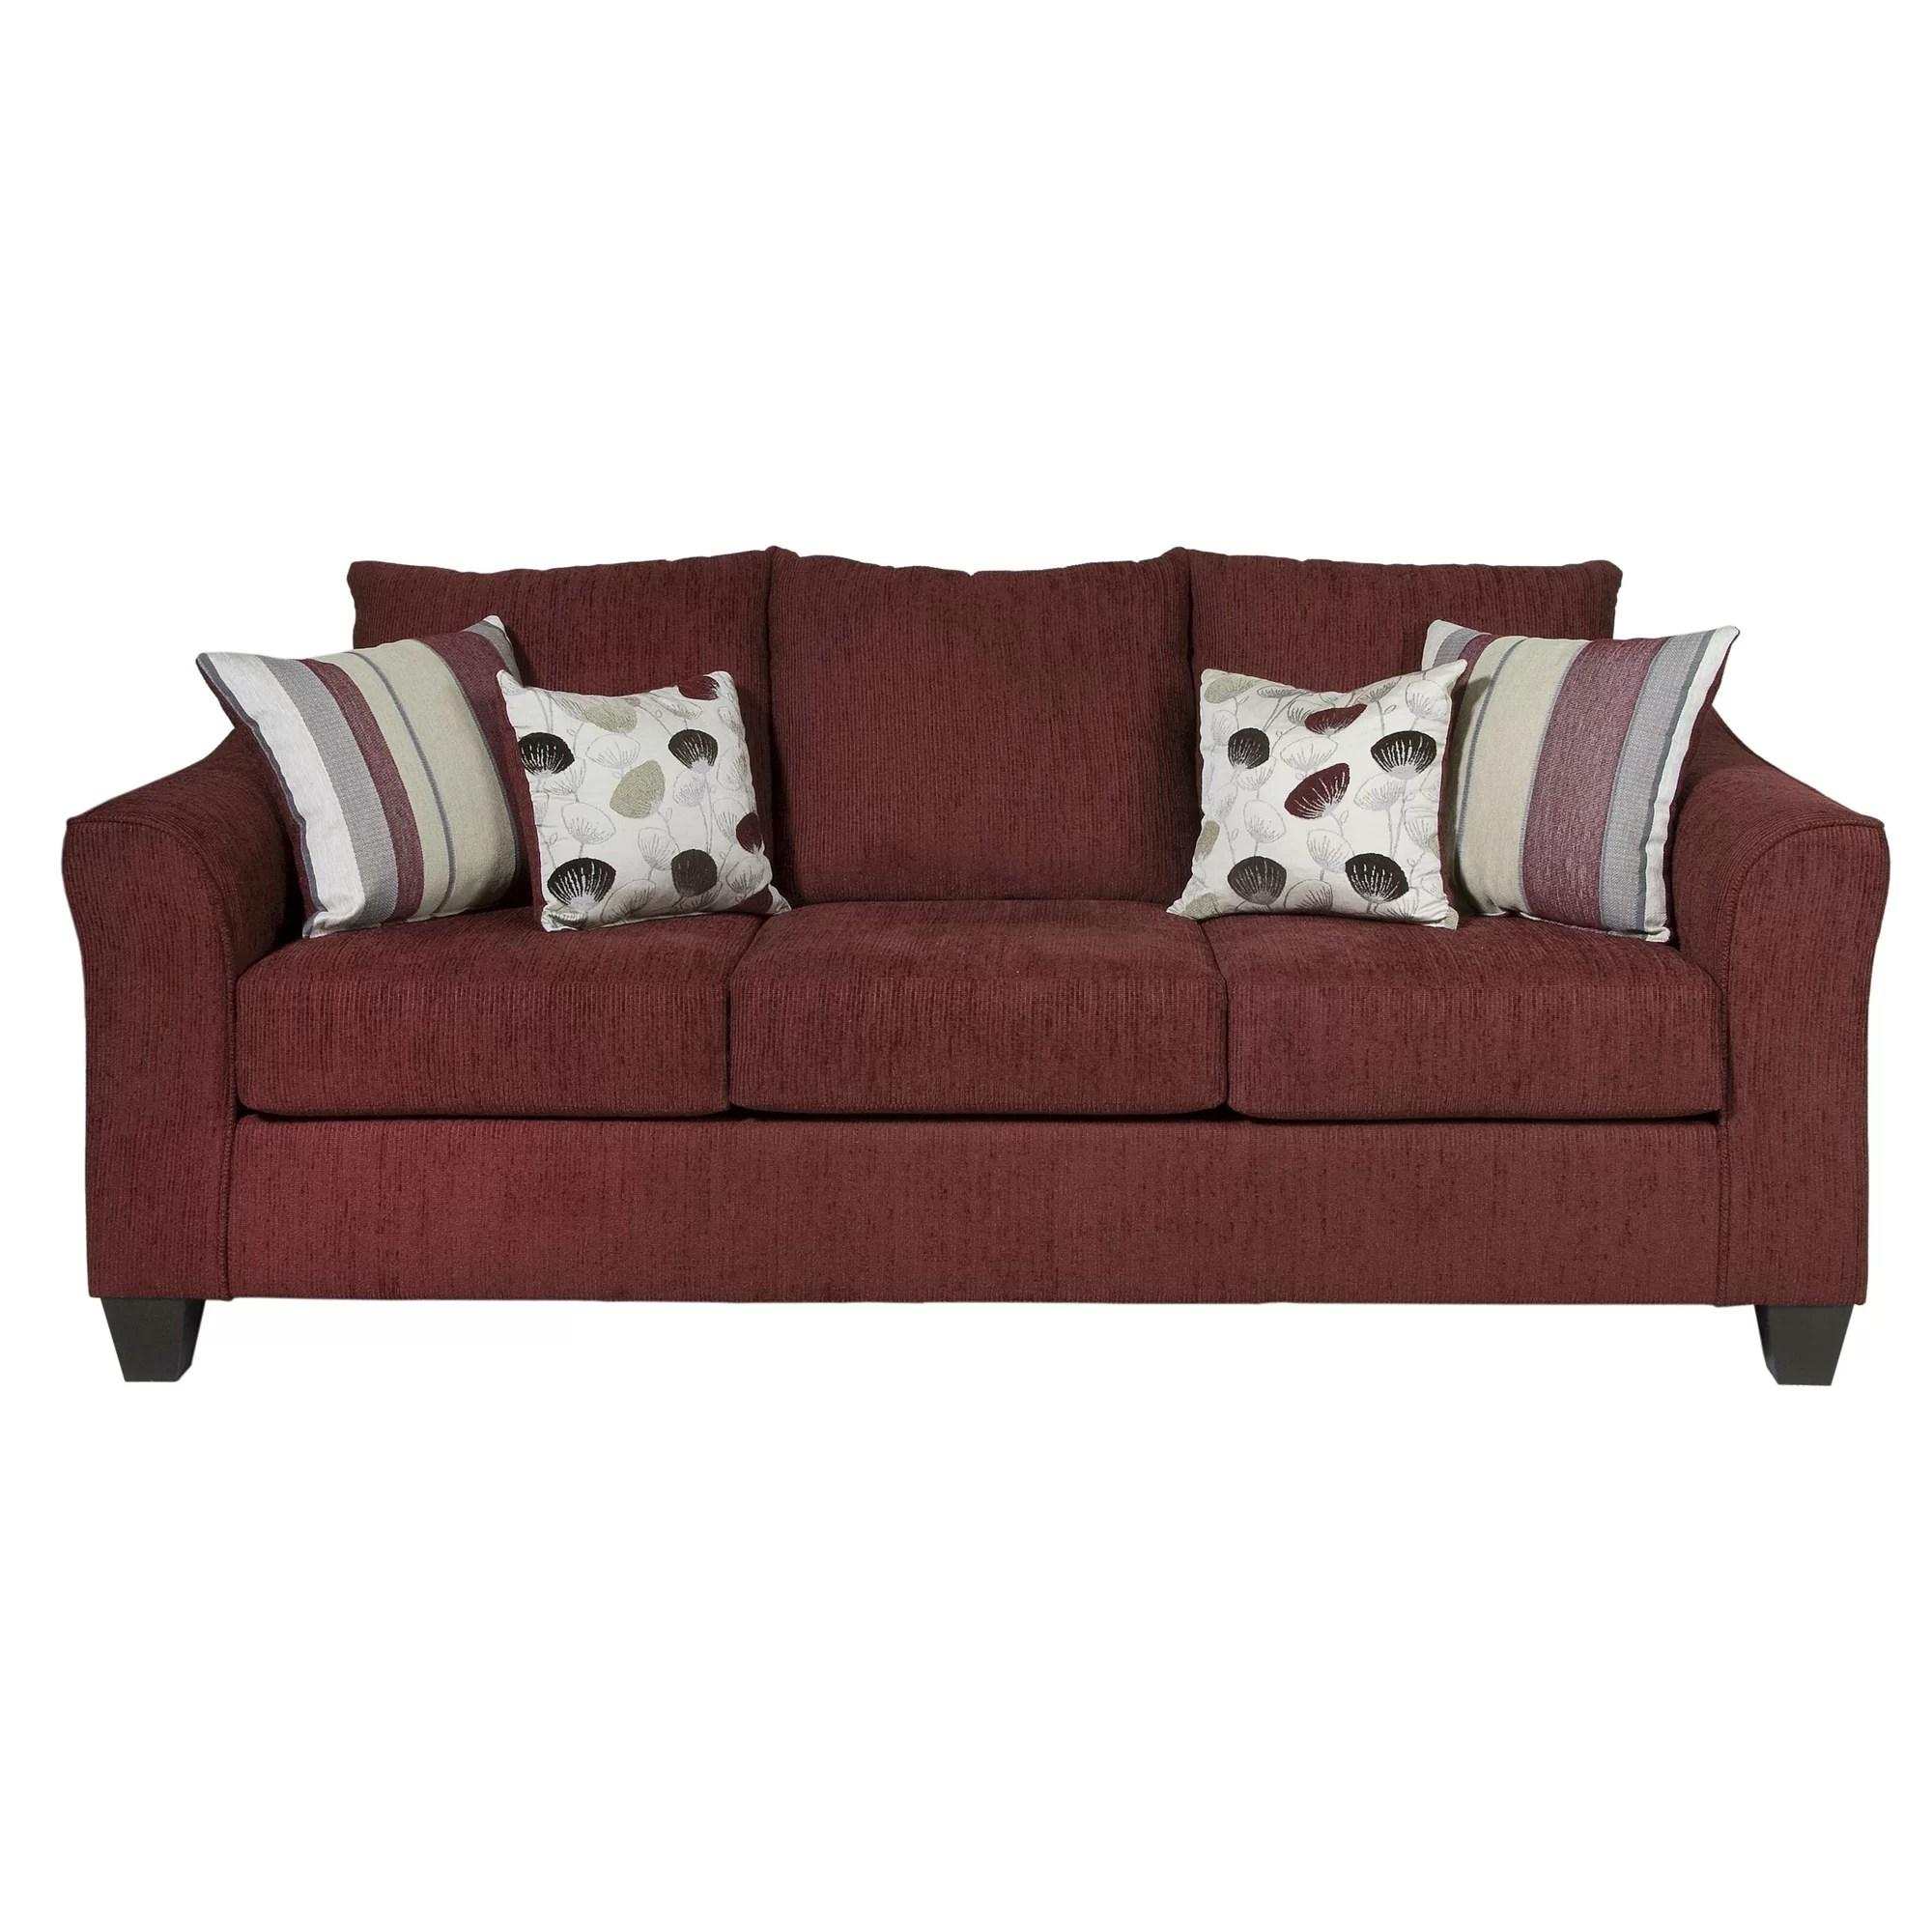 Arhaus Preston Sofa 87 Inch Tufted Upholstered In